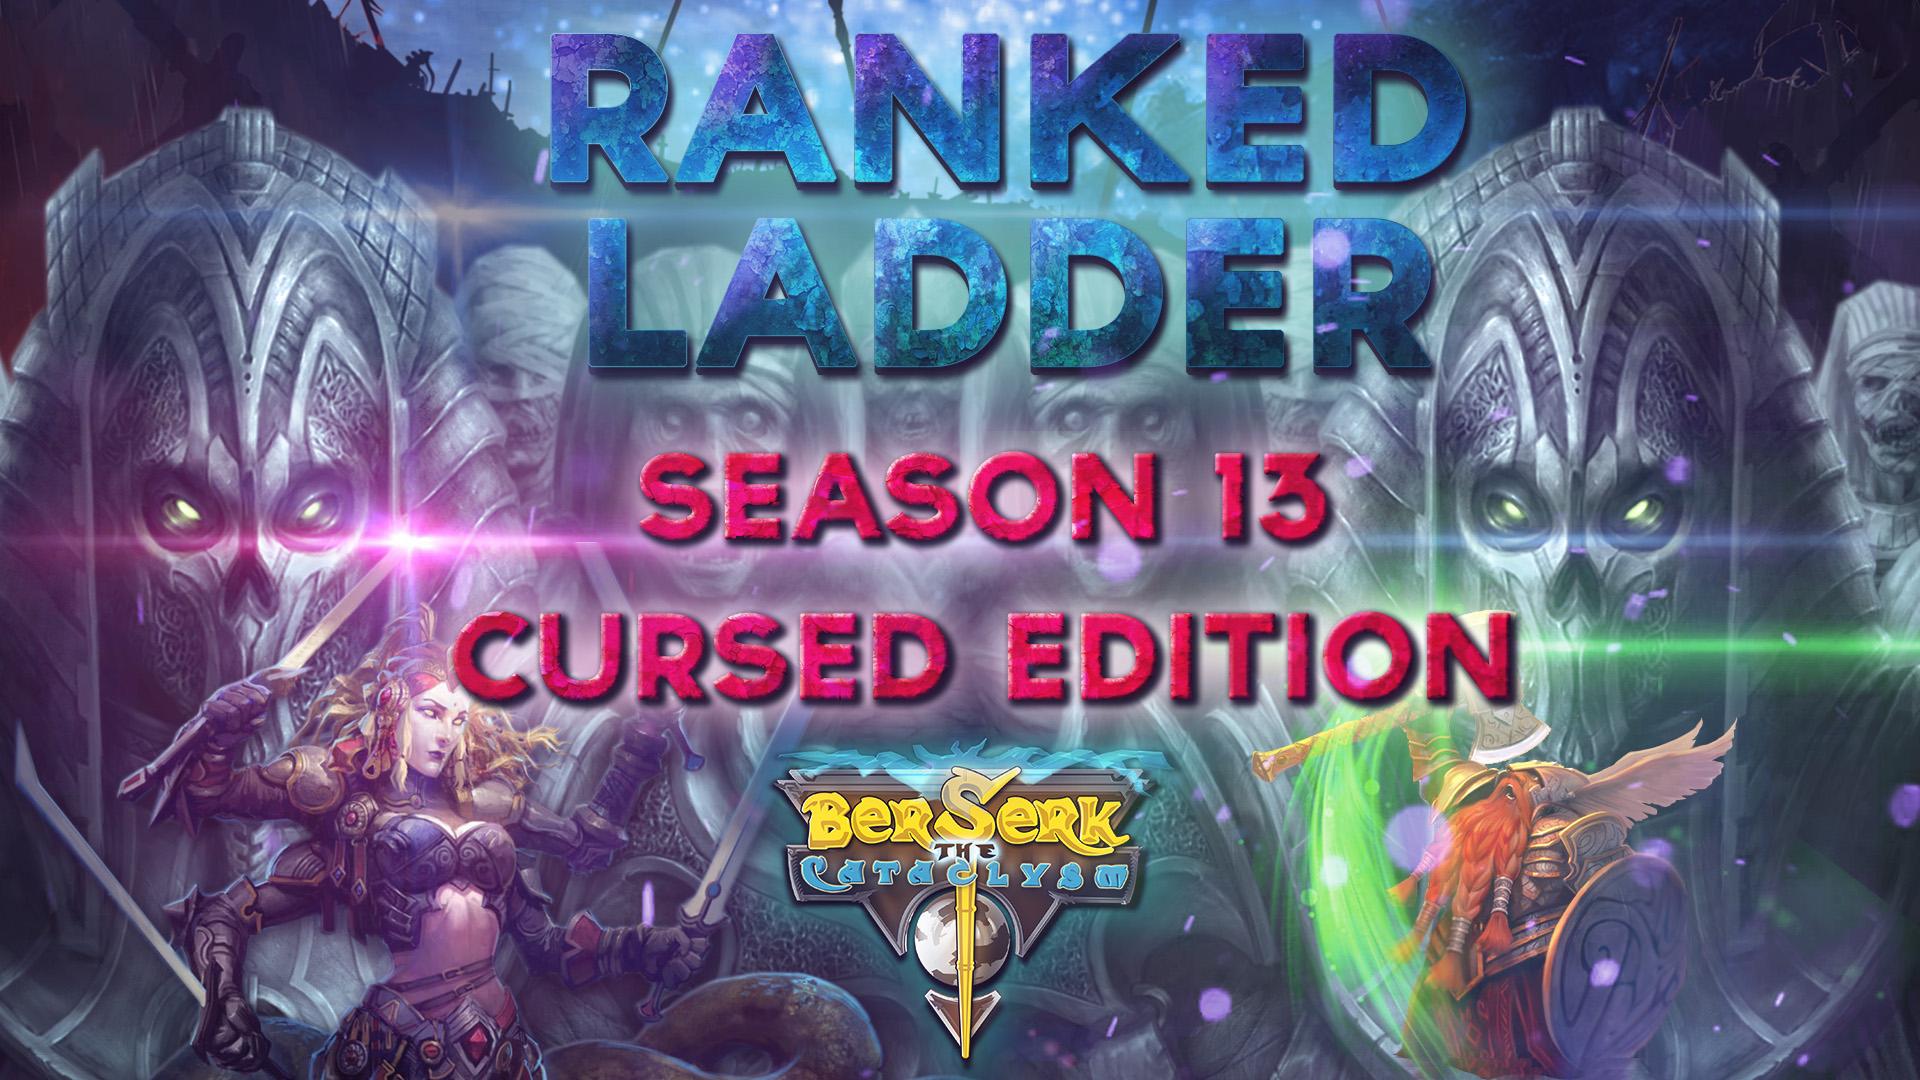 Ranked_LAdder_Season_13.jpg